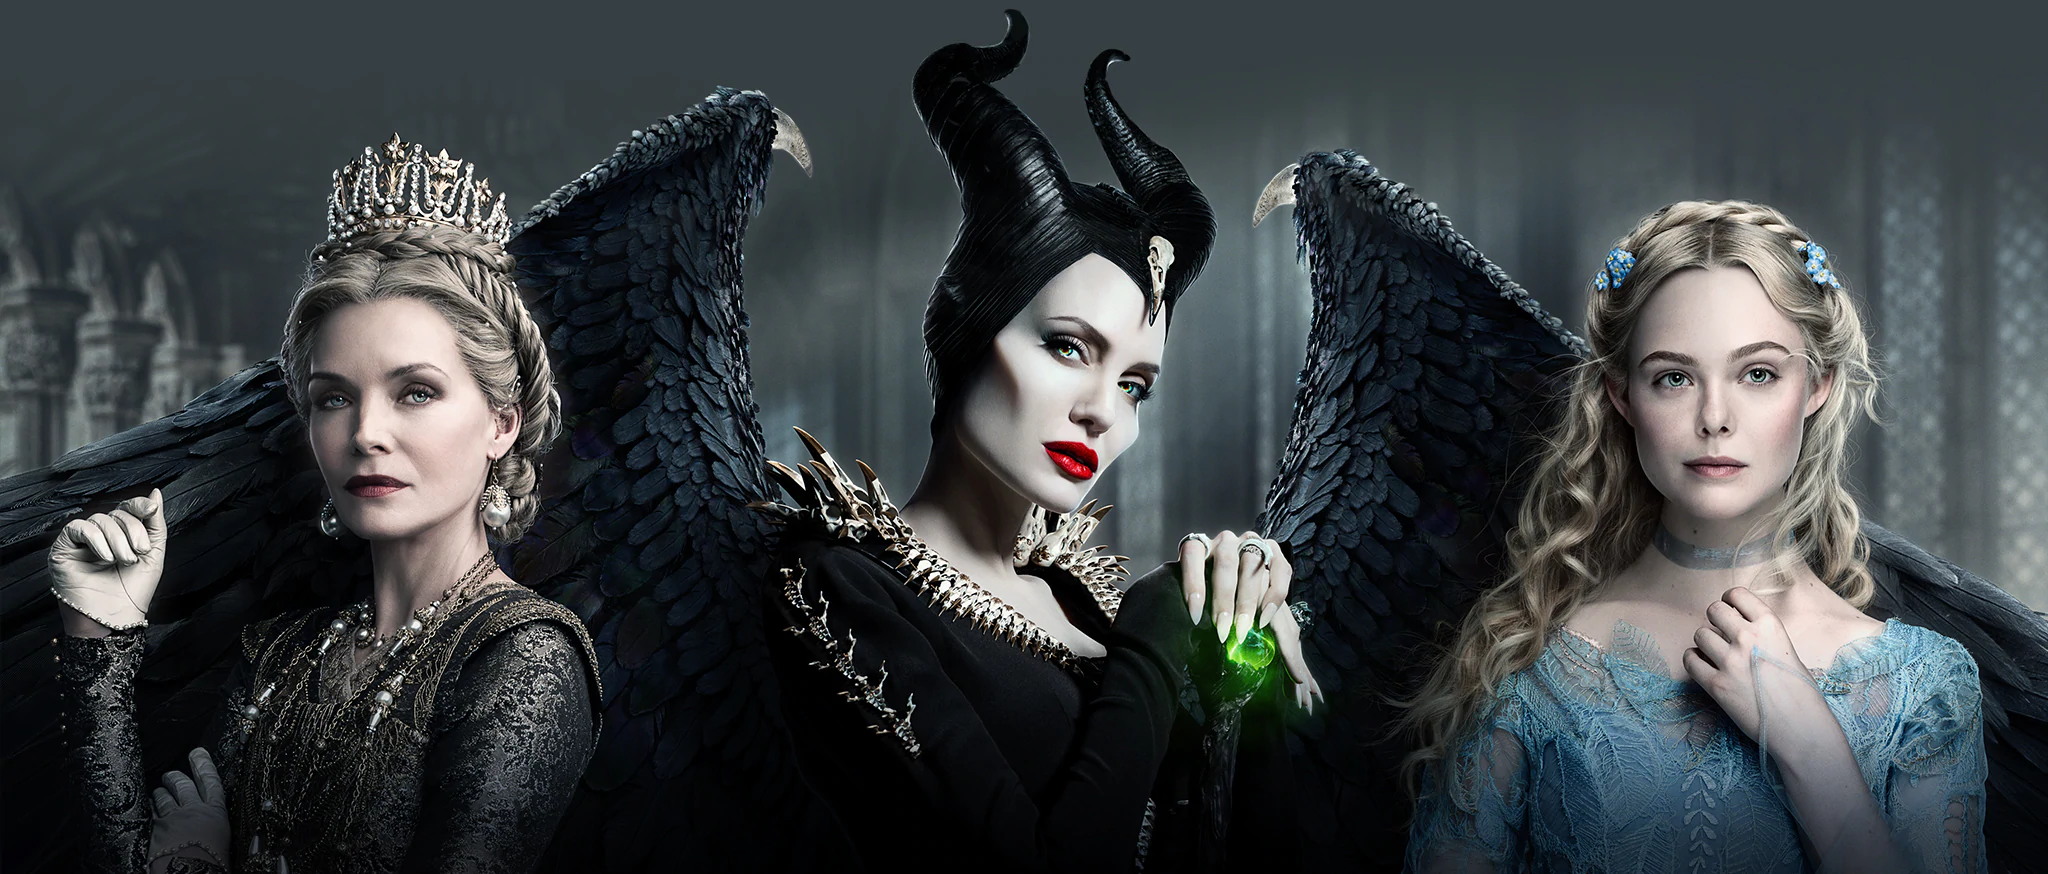 La secuela Maleficent: Mistress of Evil revela espectáculo visual en tráiler completo